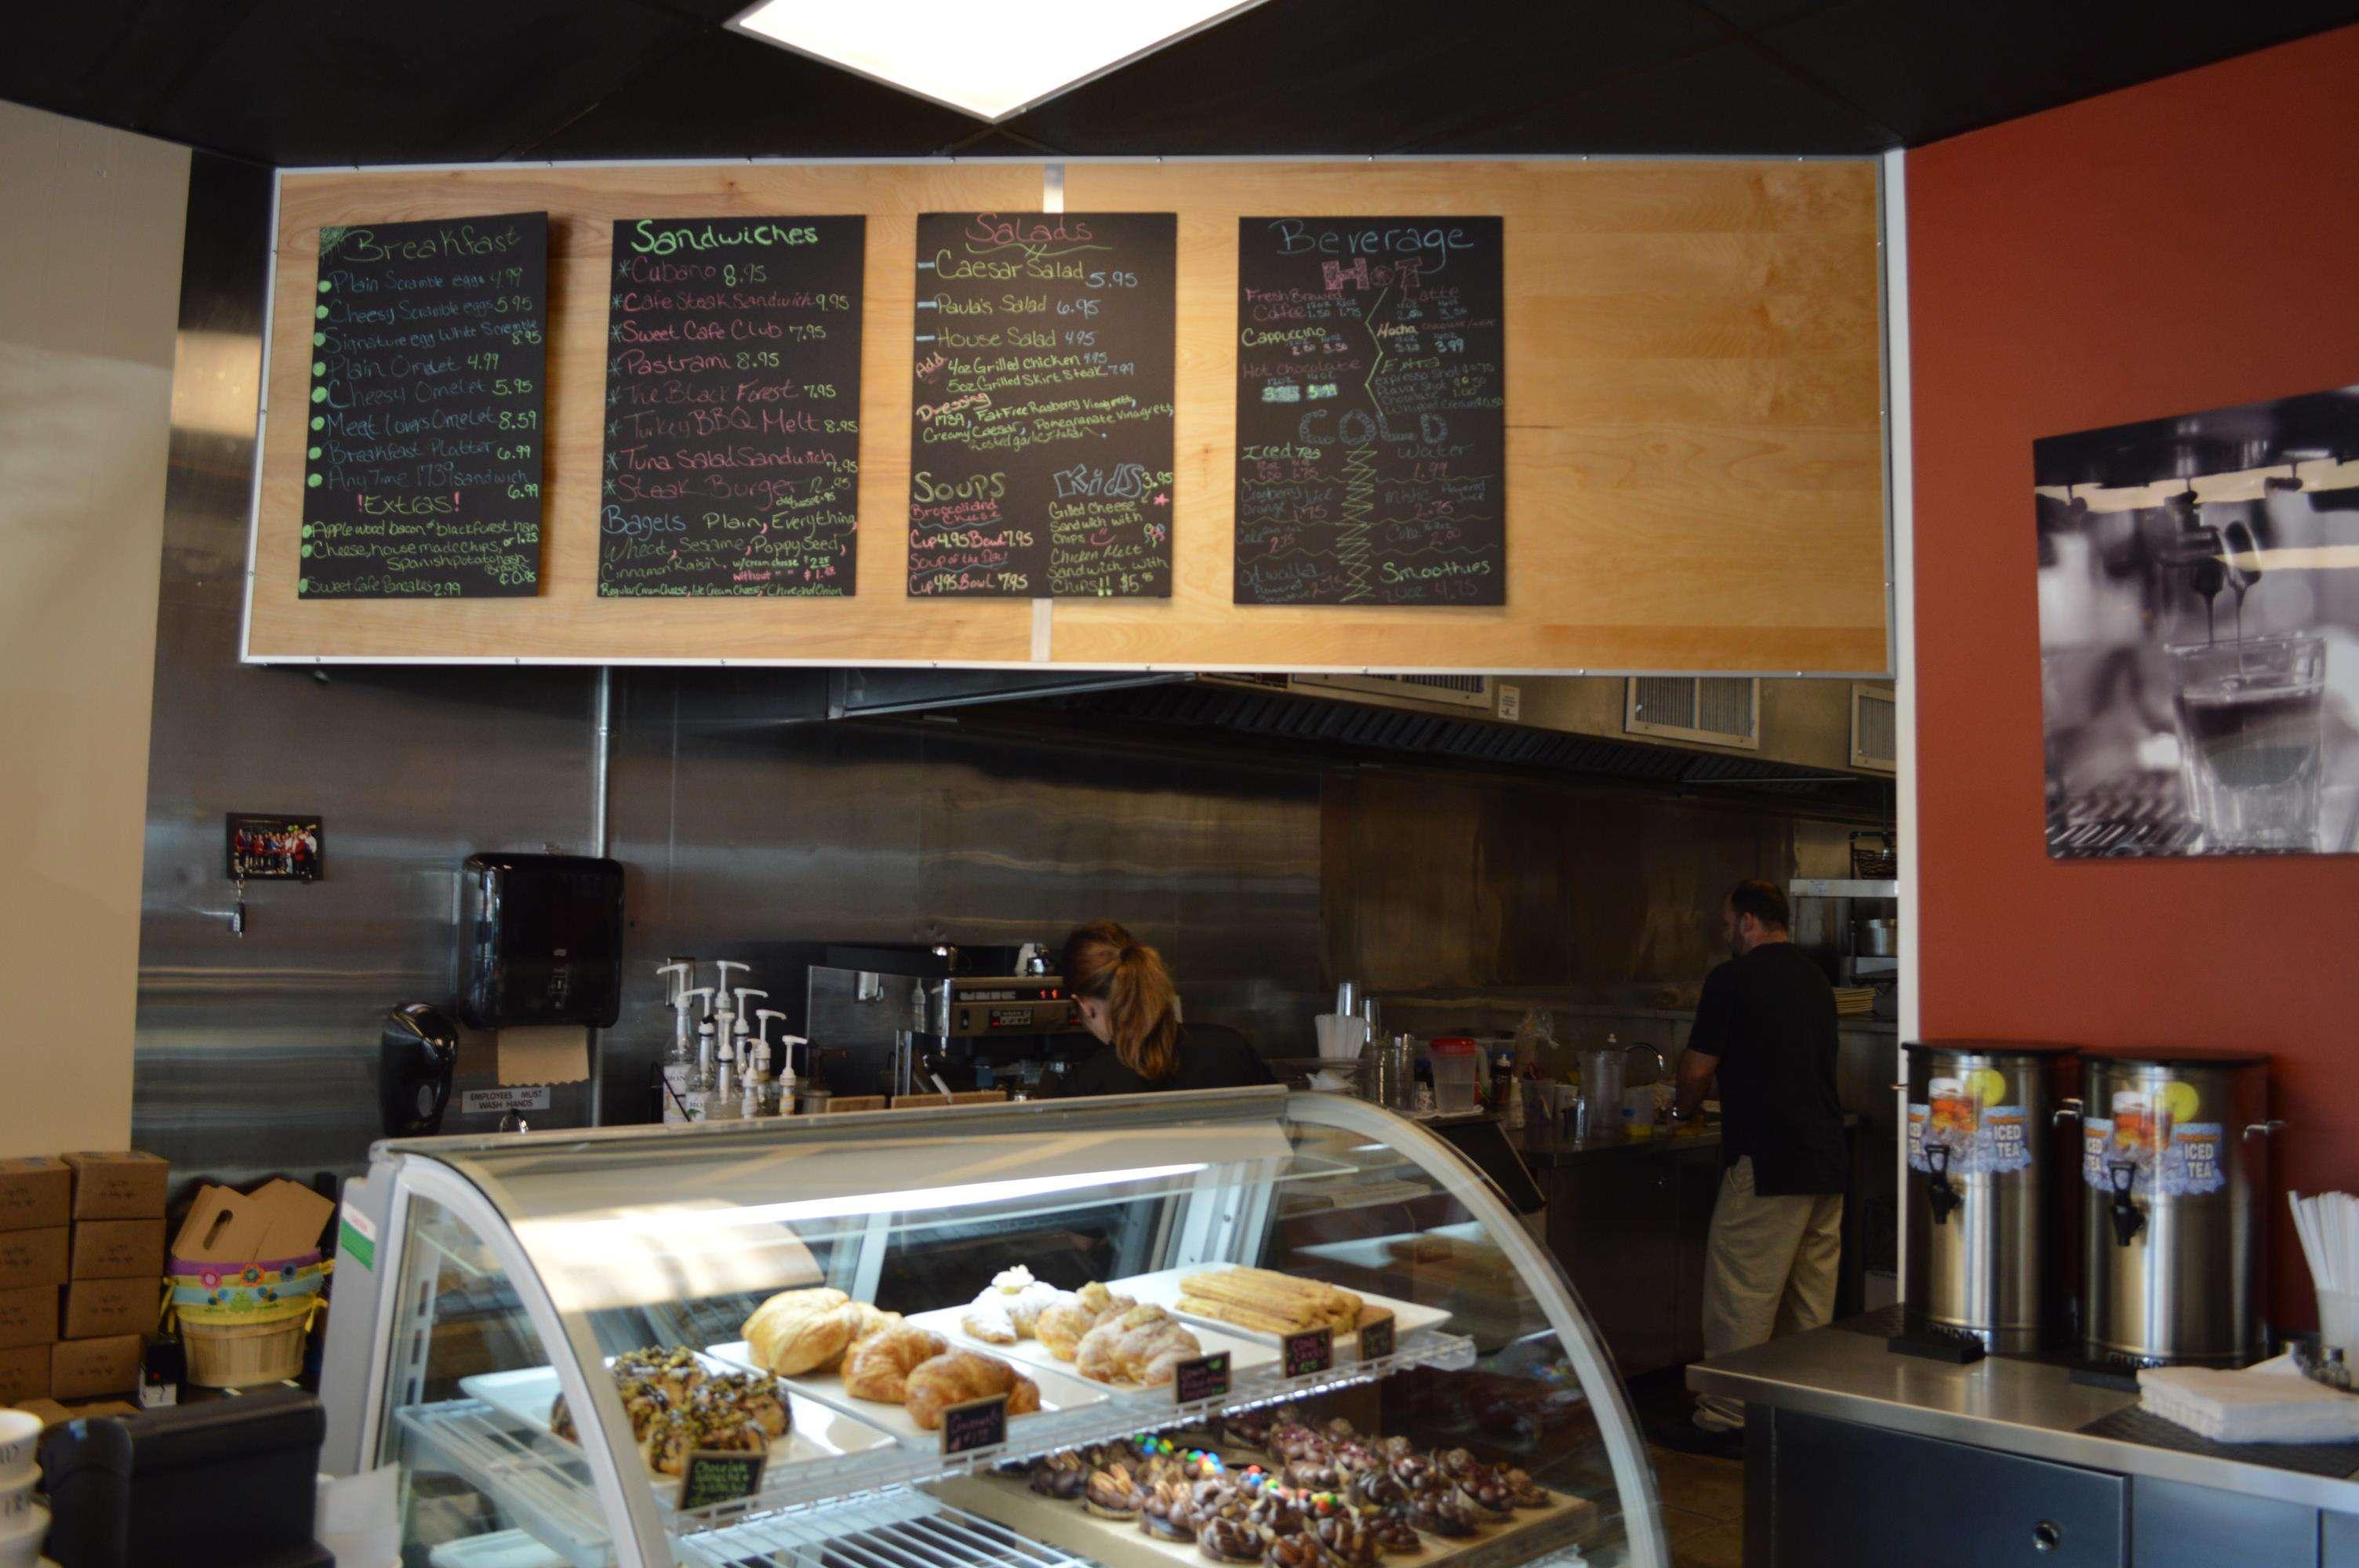 sweet cafe 1736 review hidden gem in winter garden off on the go